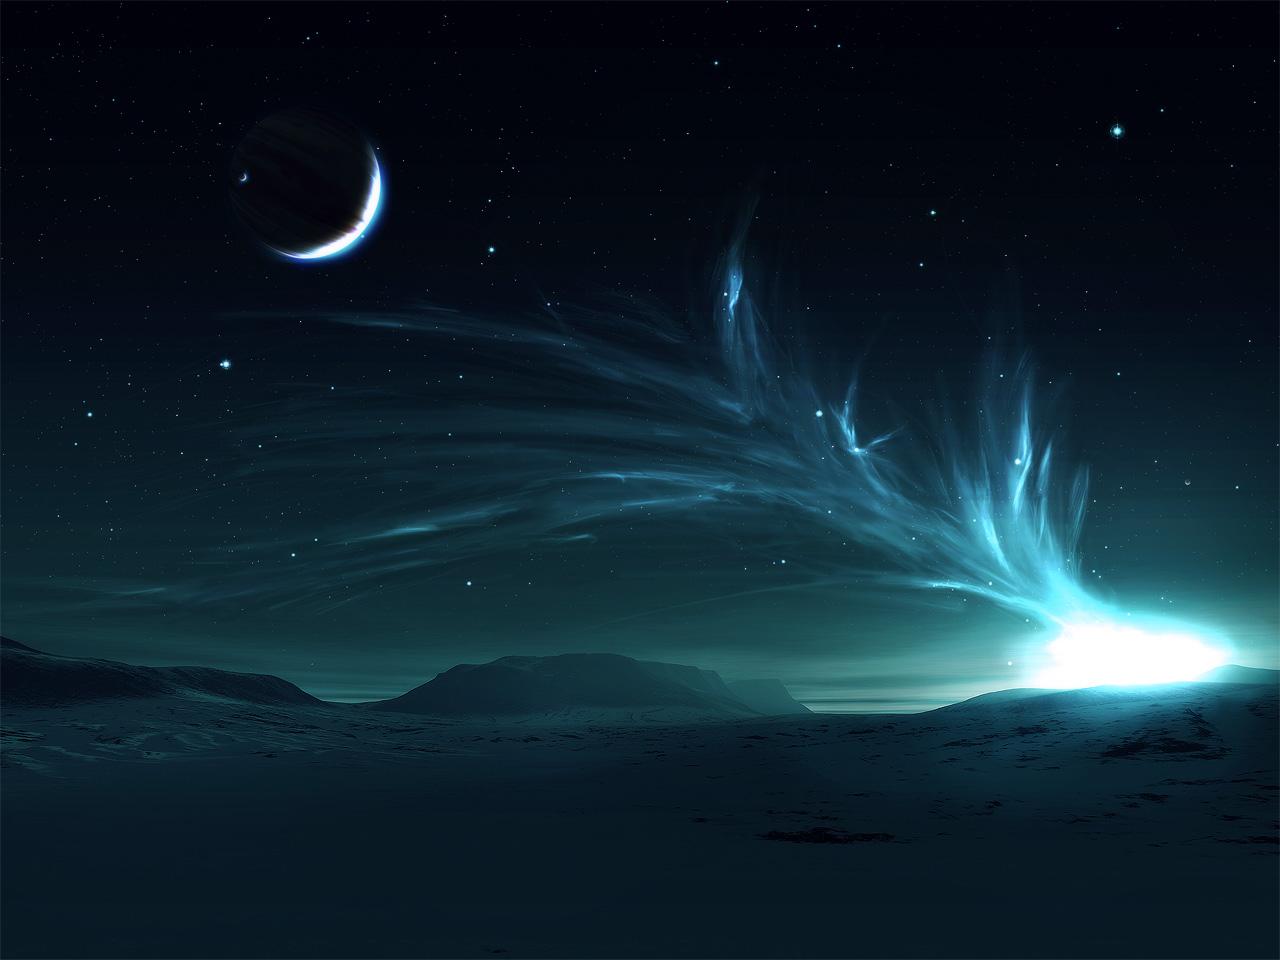 aurora borealis or northern lights 40 see the northern lights